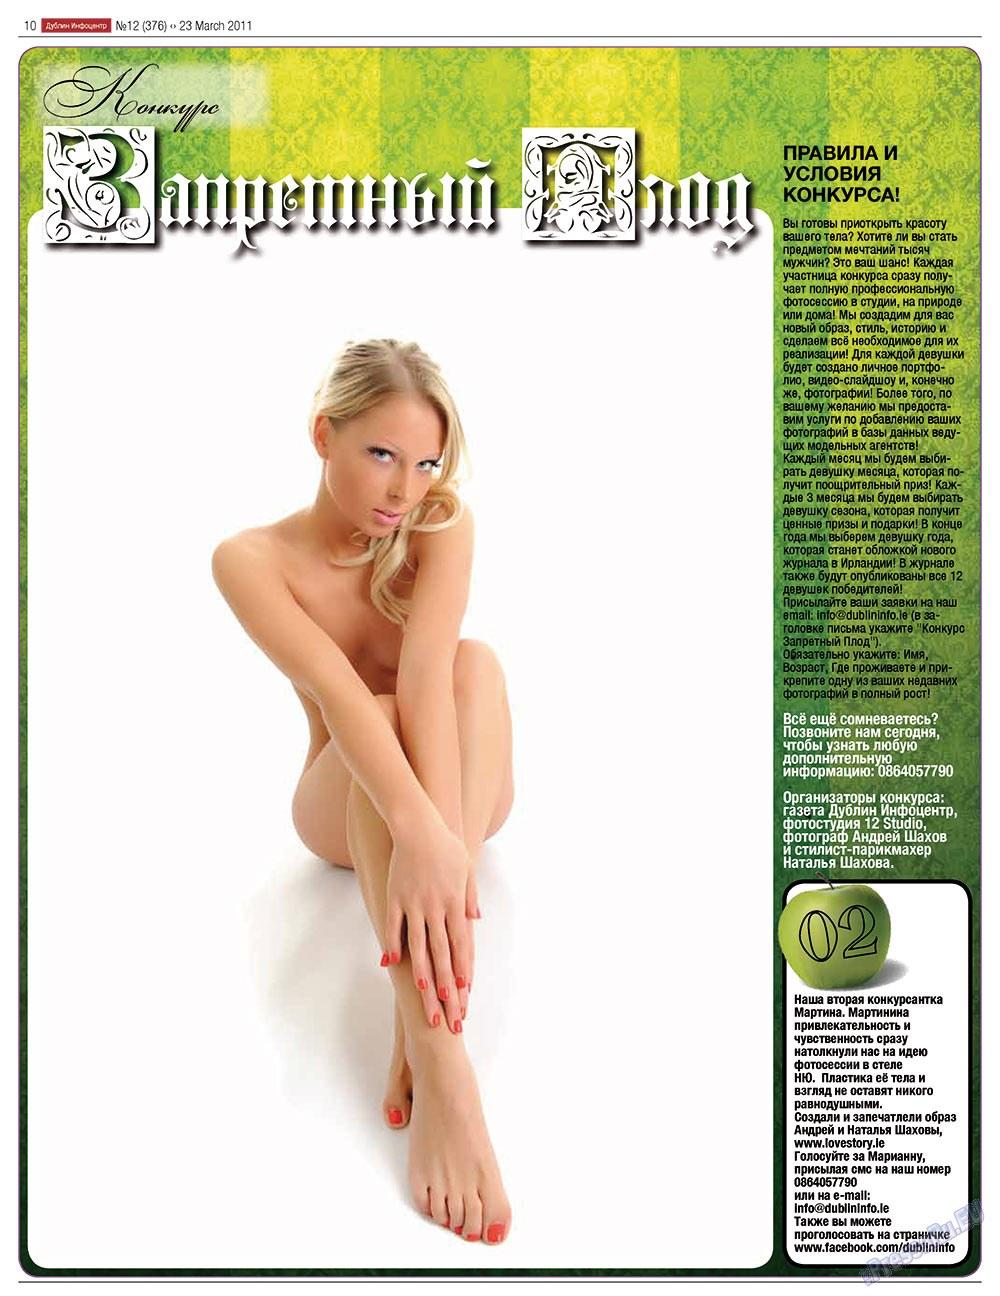 Дублин инфоцентр (газета). 2011 год, номер 12, стр. 10